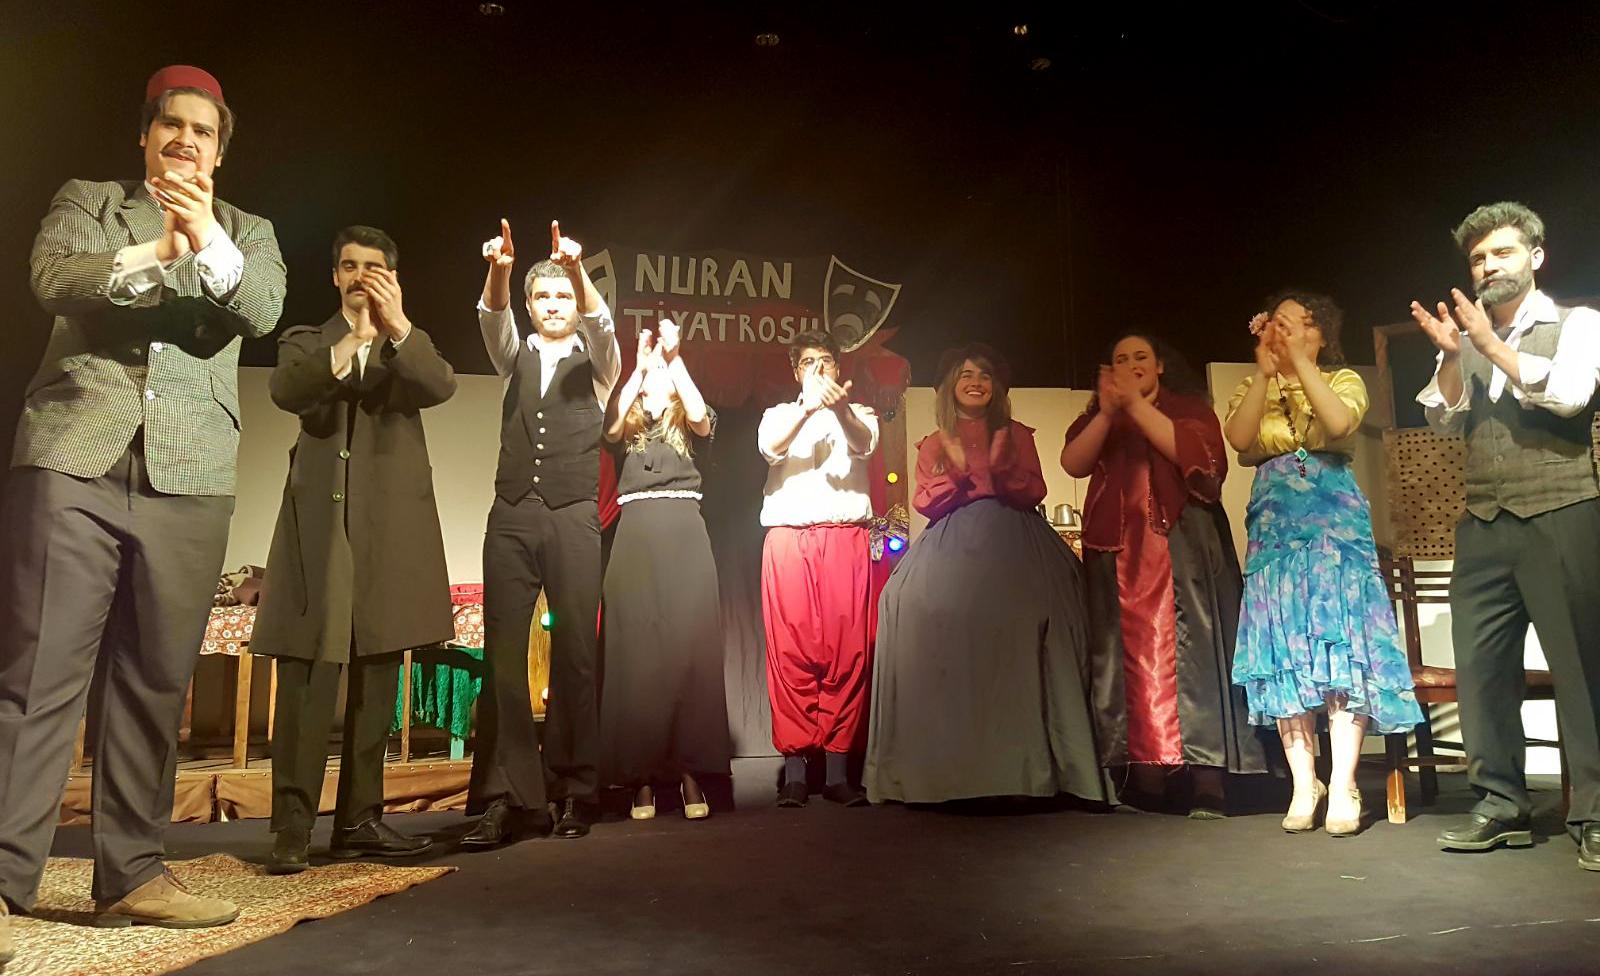 http://www.omu.edu.tr/sites/default/files/files/omu_24._ulusal_tiyatro_festivali_basladi/whatsapp_image_2018-04-15_at_17.38.12.jpeg